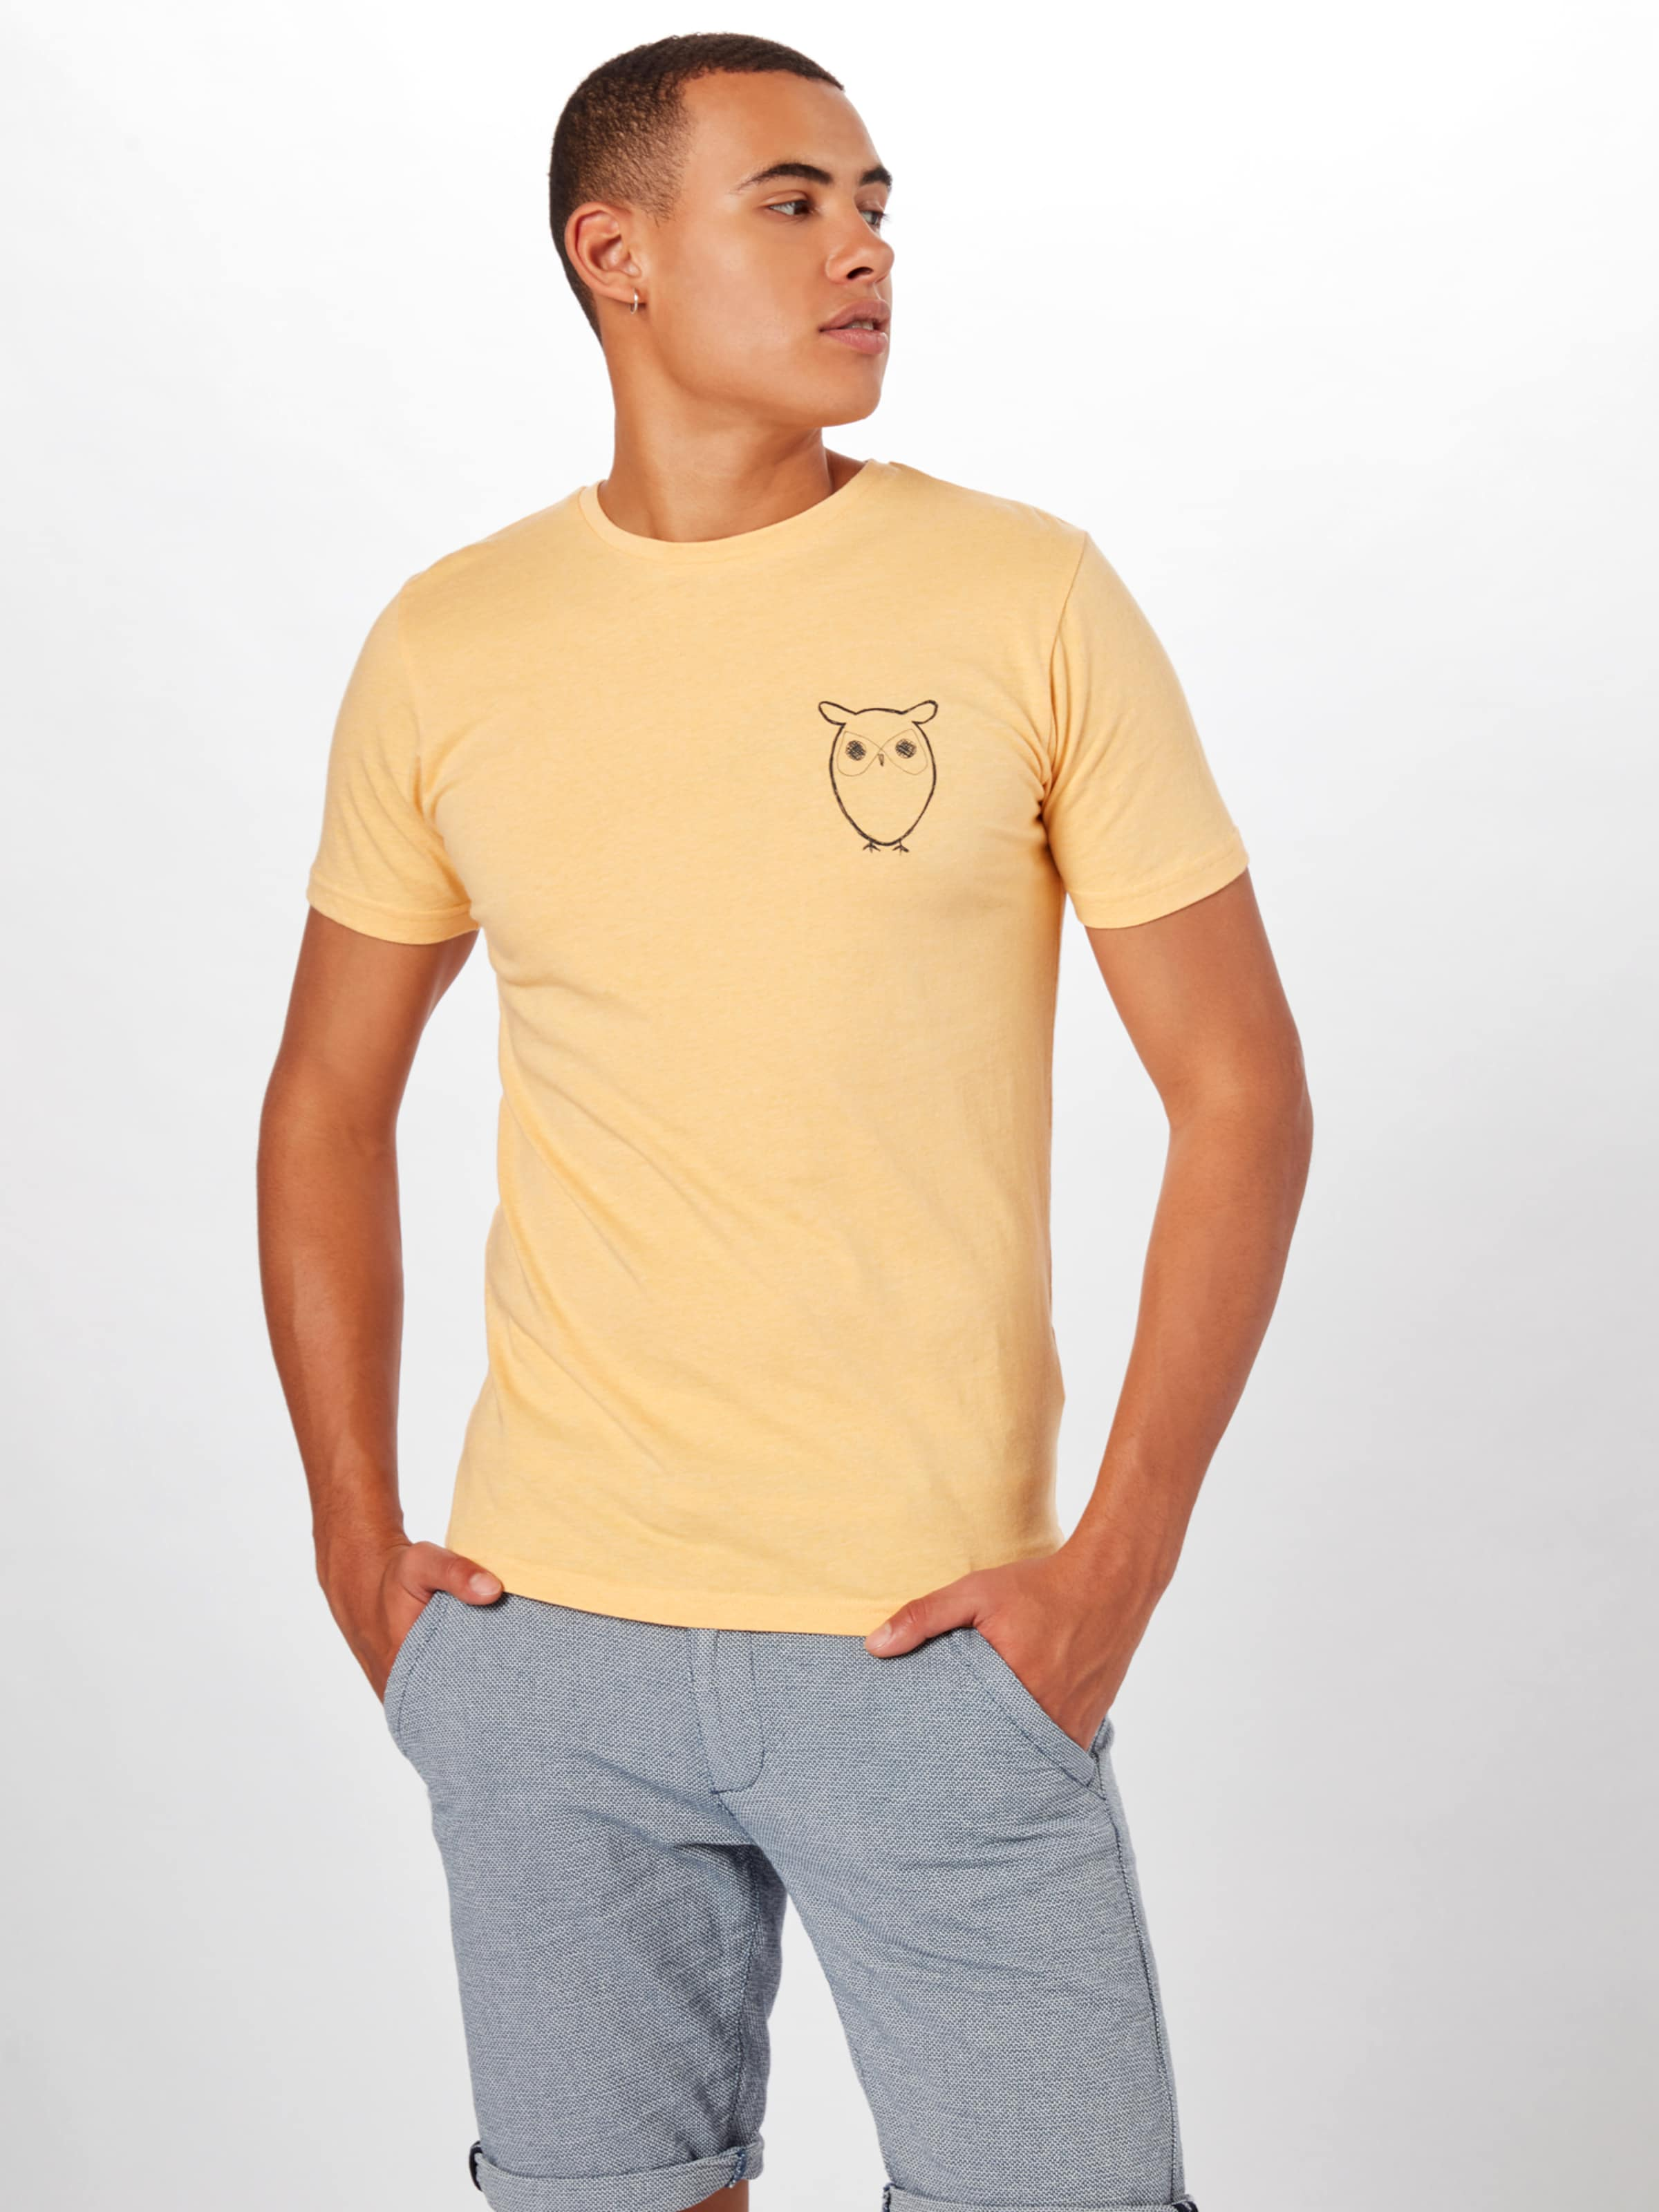 Knowledgecotton Moutarde T shirt En Apparel 0mnONw8yv